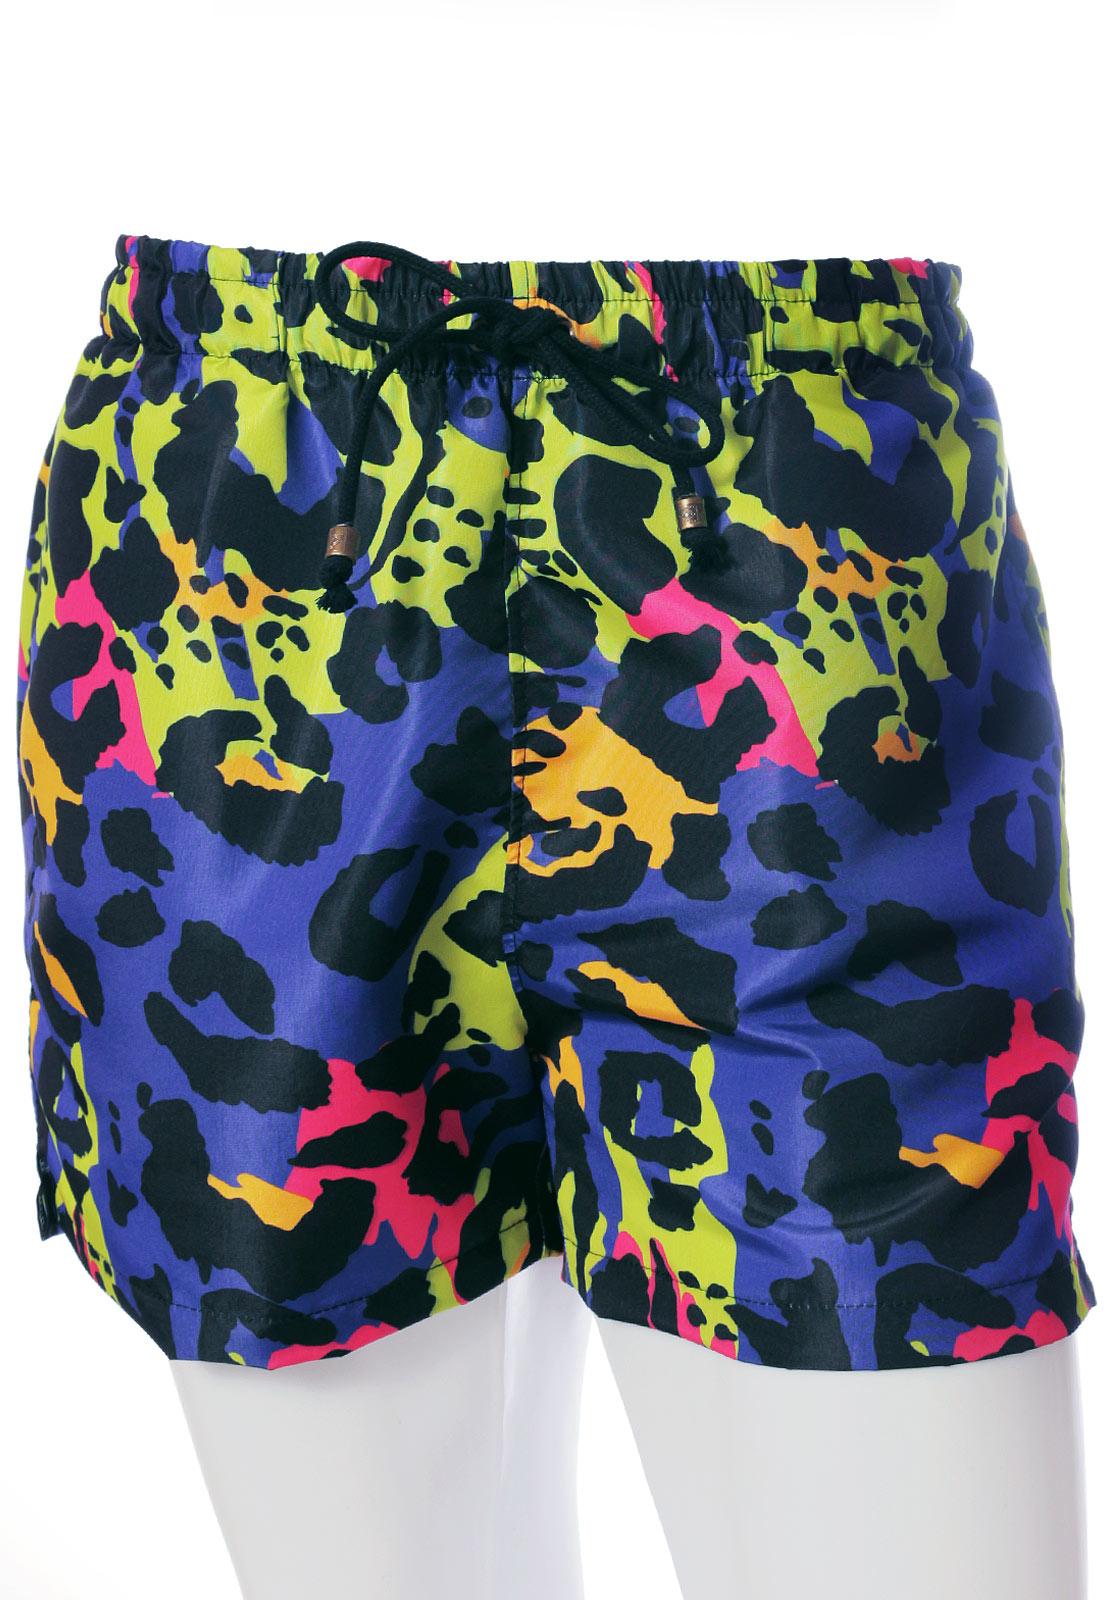 Shorts Neon Animal Print Estampado ElephunK Sem Gênero Roxo